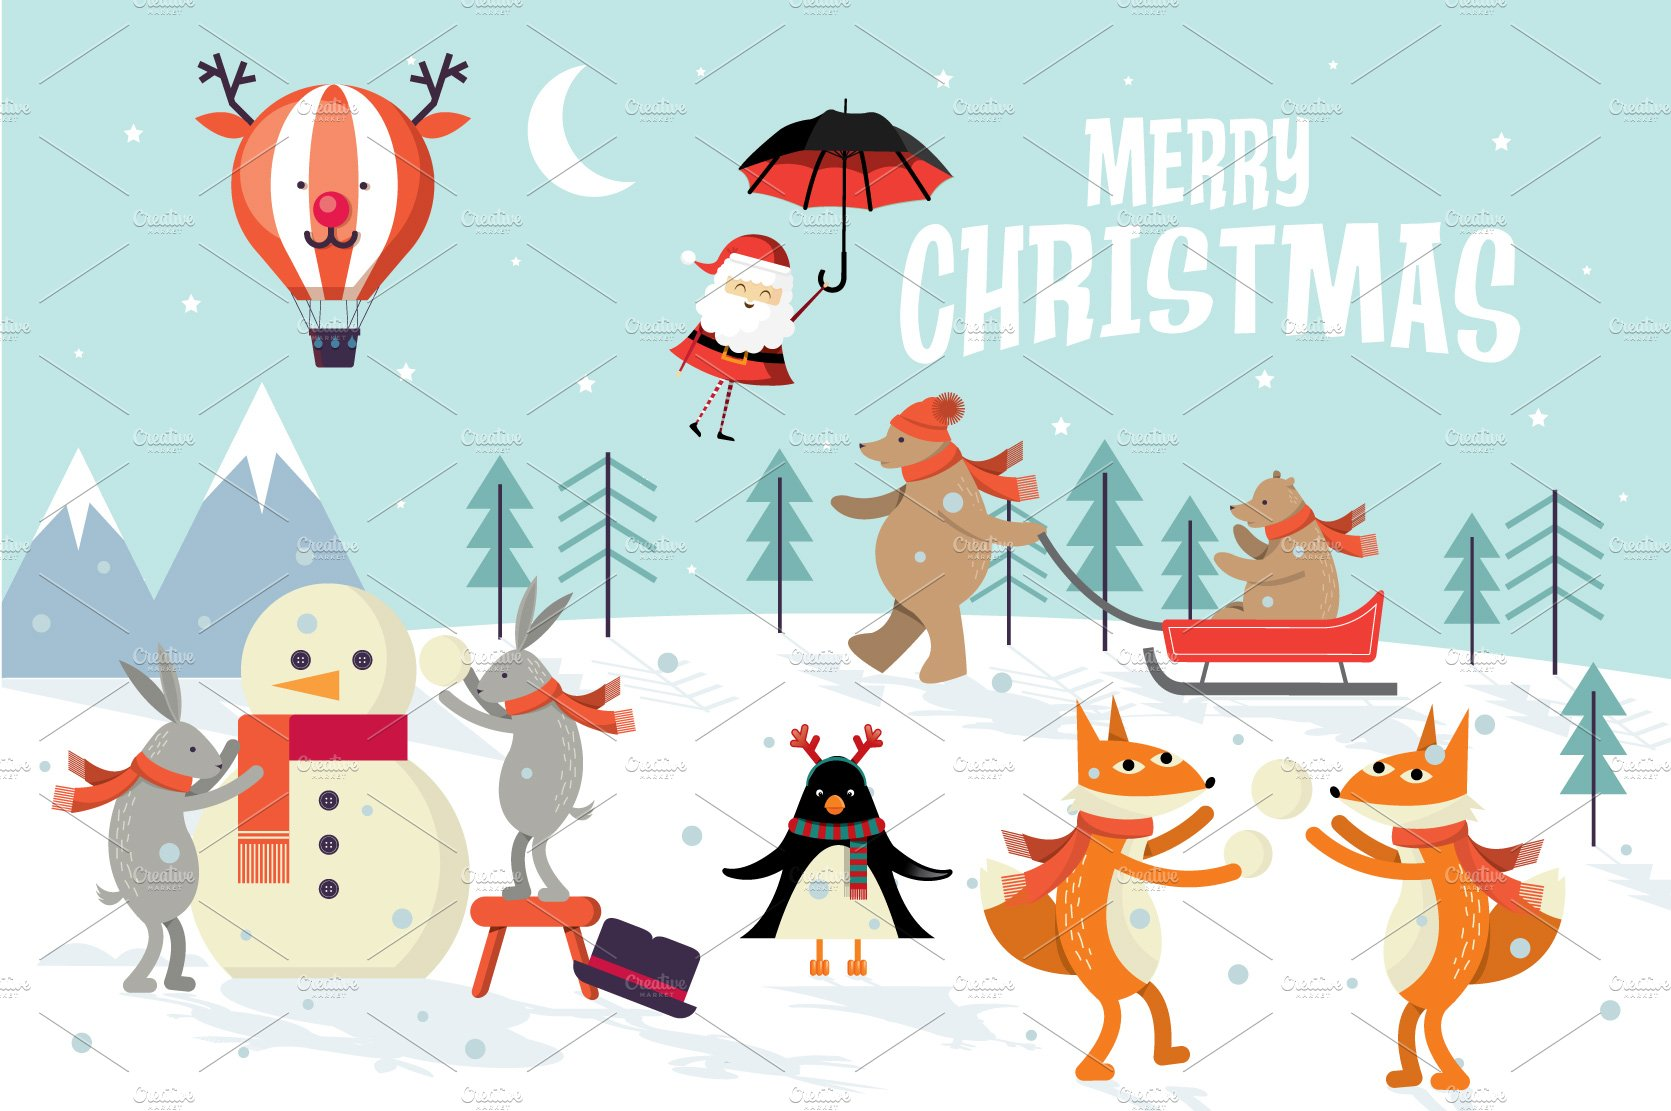 Christmas Greetings Template Vector Illustrations Creative Market